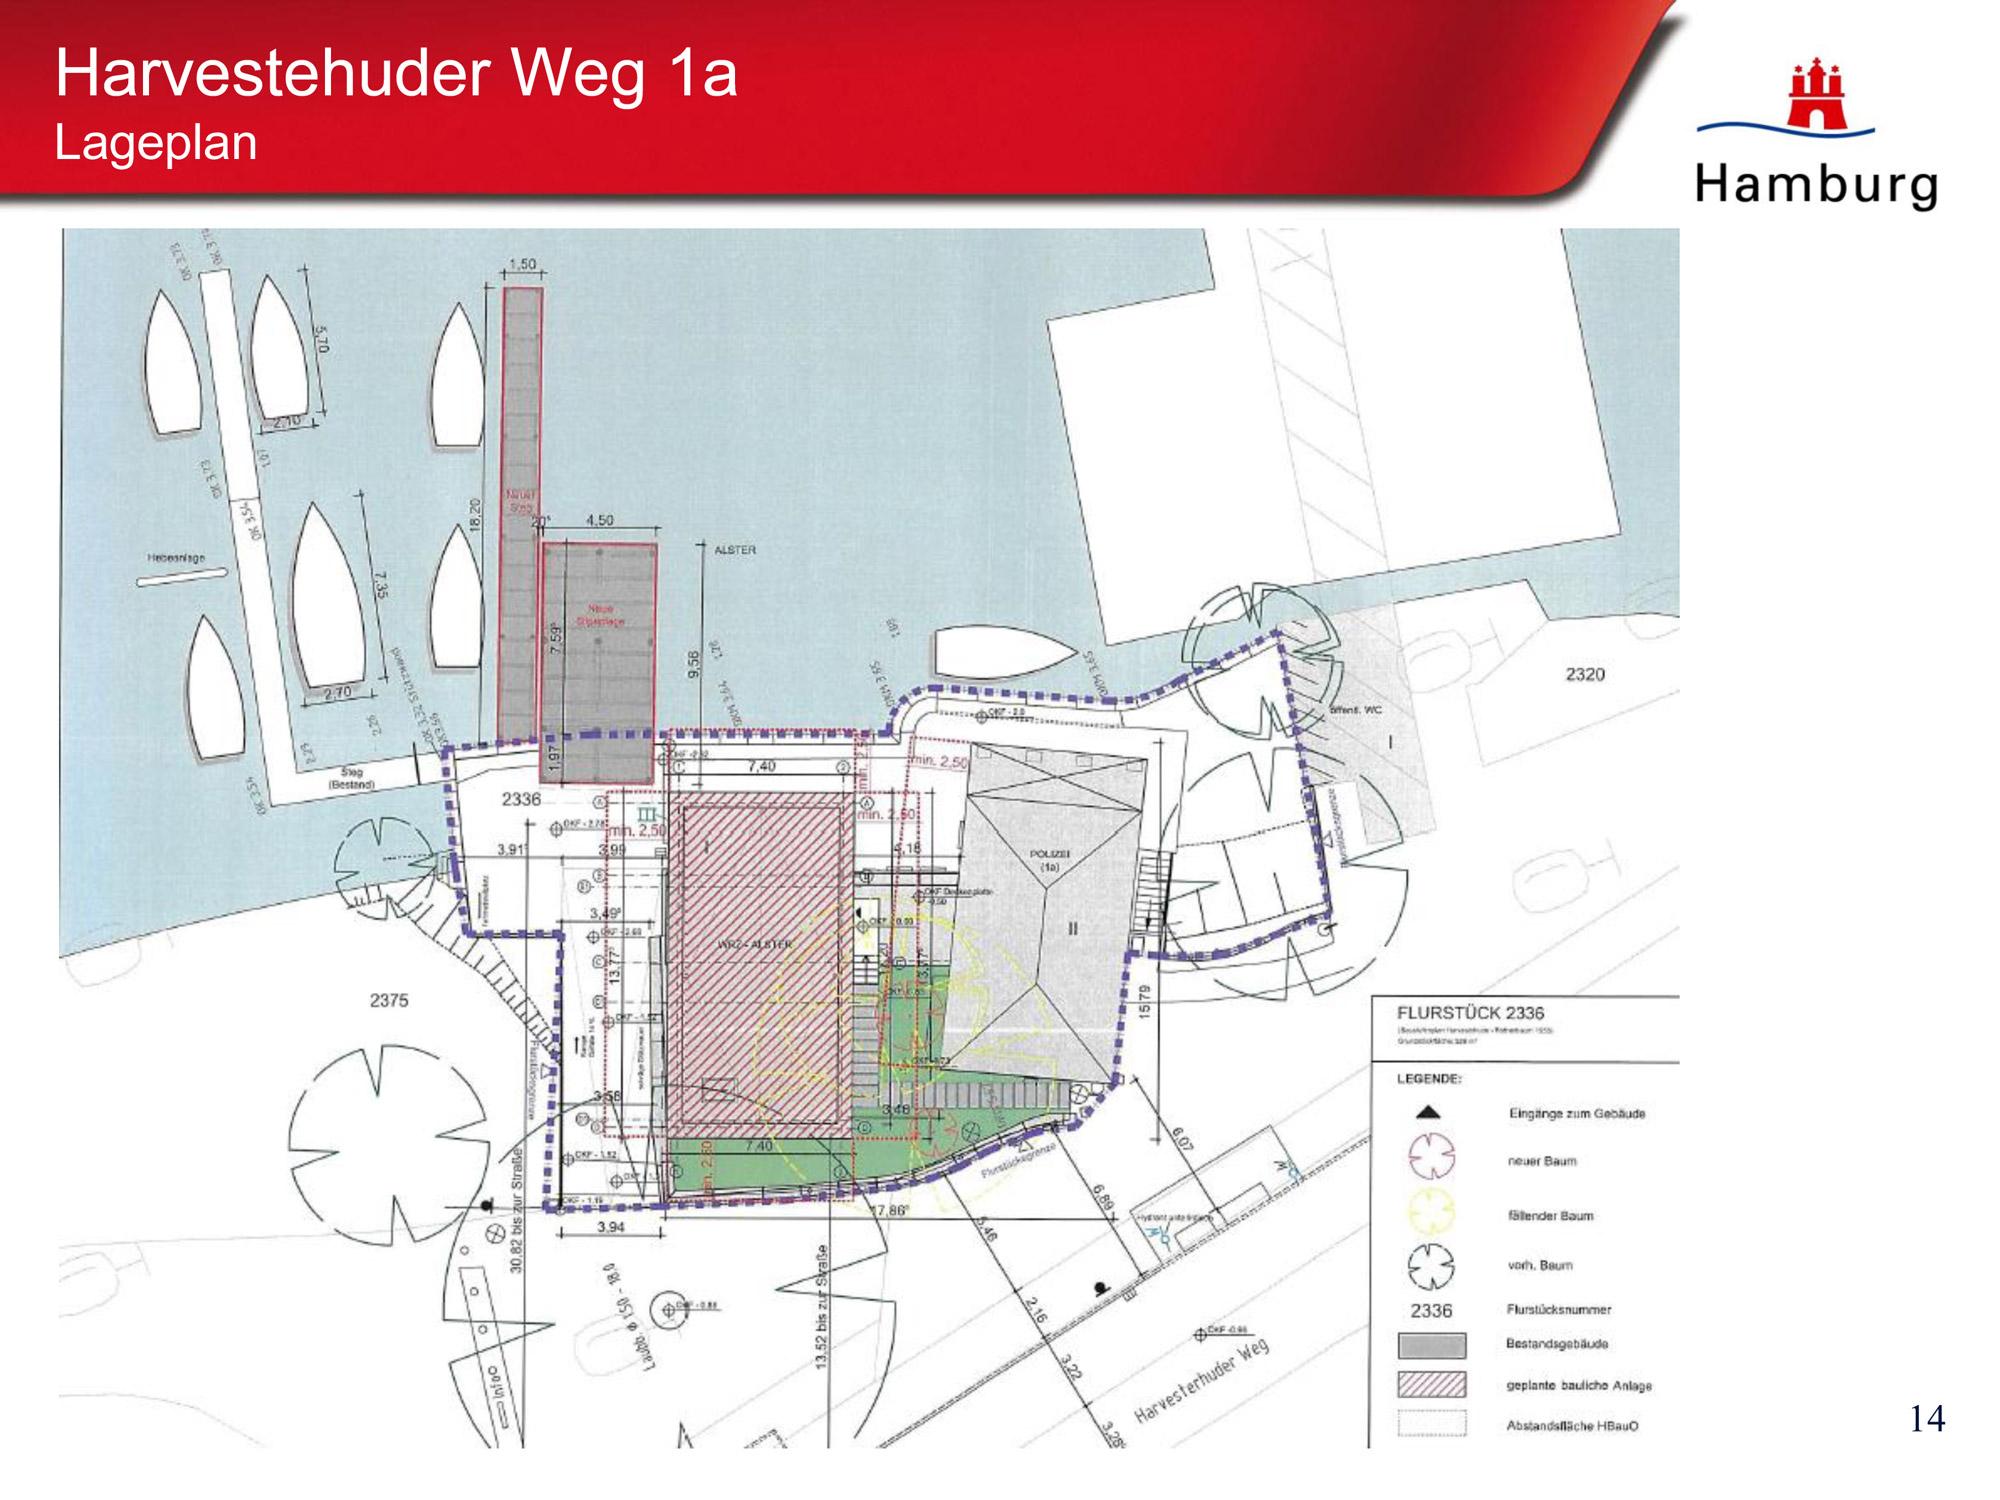 Präsentaion Bezirksamt Eimsbüttel